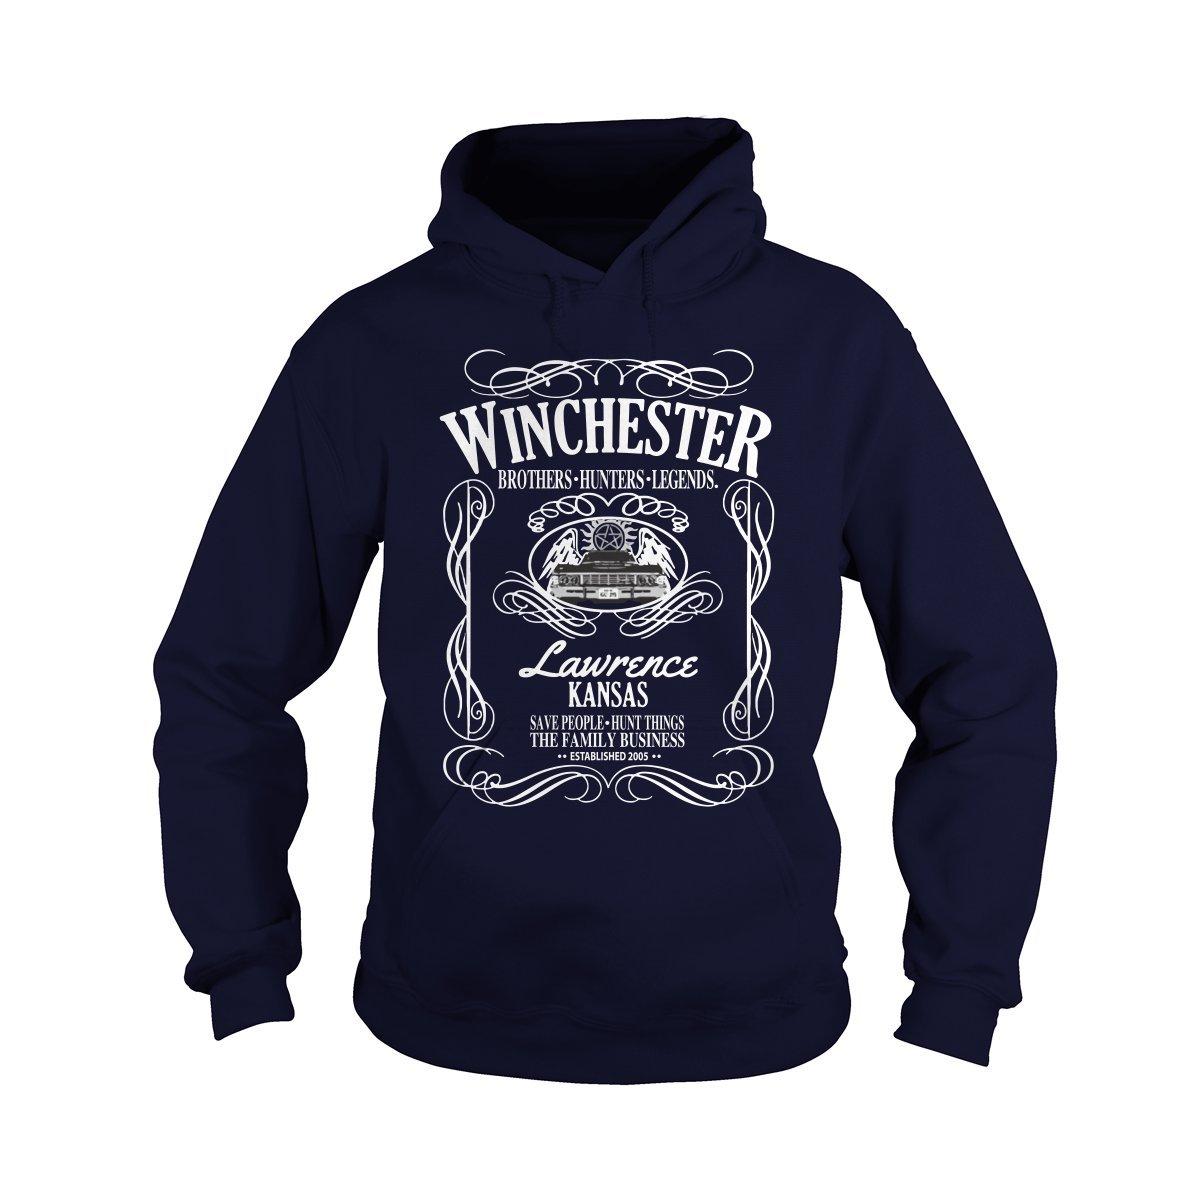 Hoodie Navy blueee XXXLarge ShinyKT Winchester Bredhers, Hunter and Legends TShirt